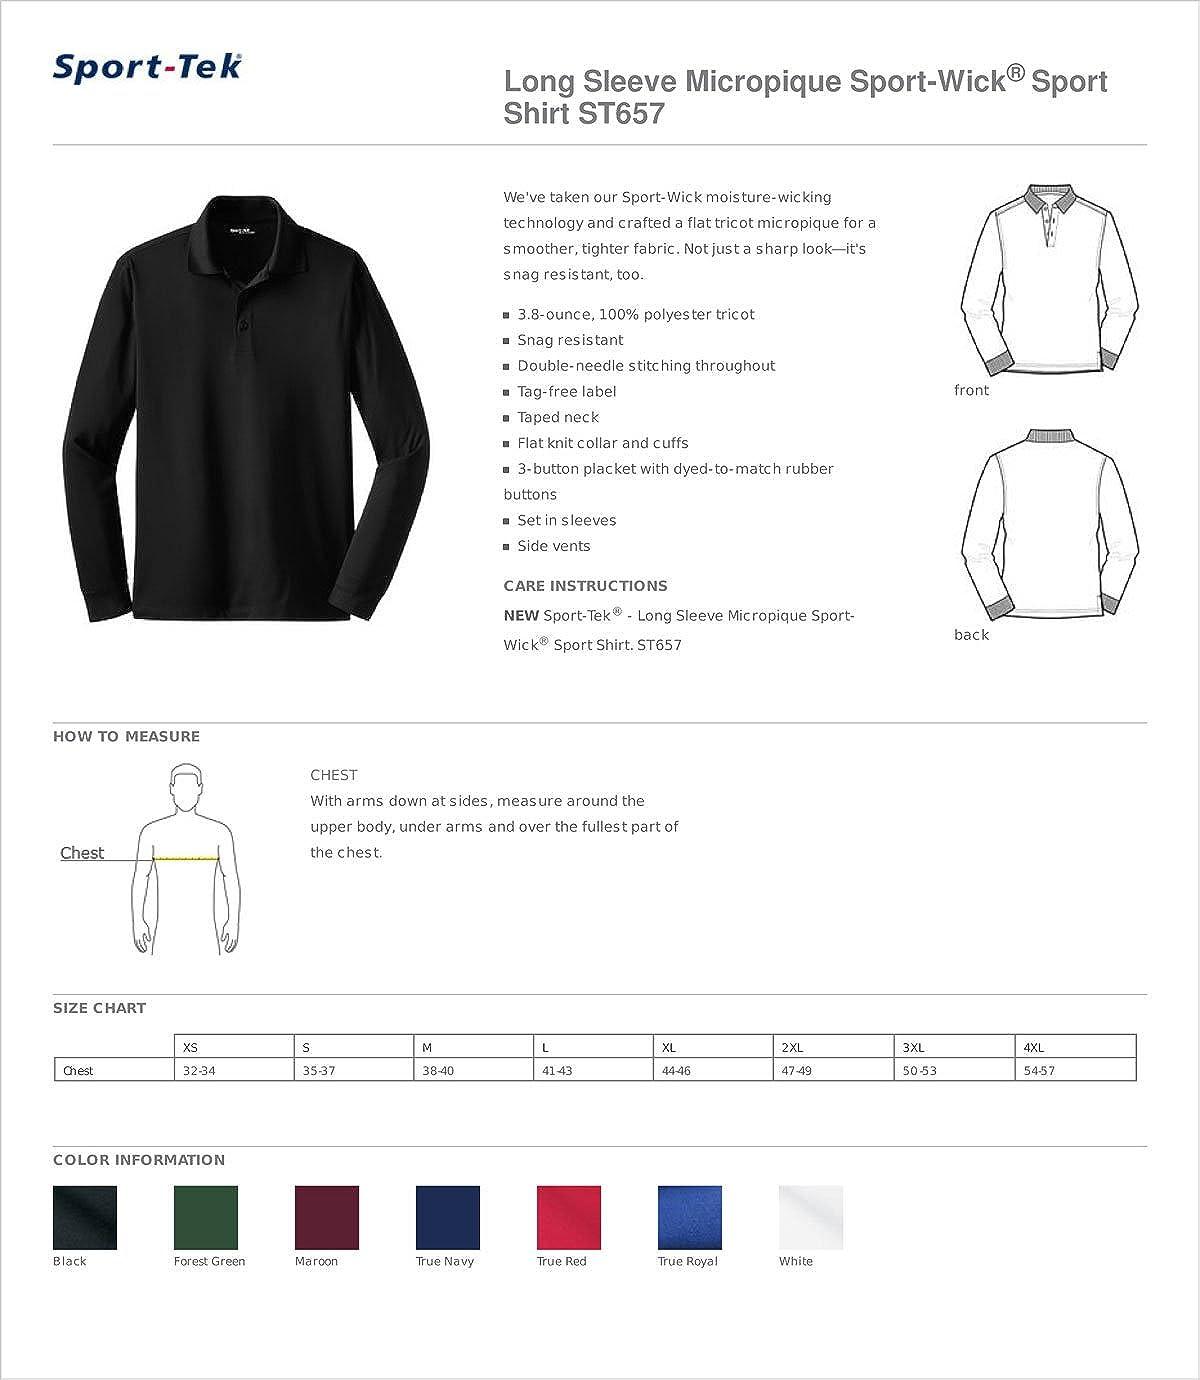 Sport-Tek Long Sleeve Micropique Sport-Wick Sport Shirt, White